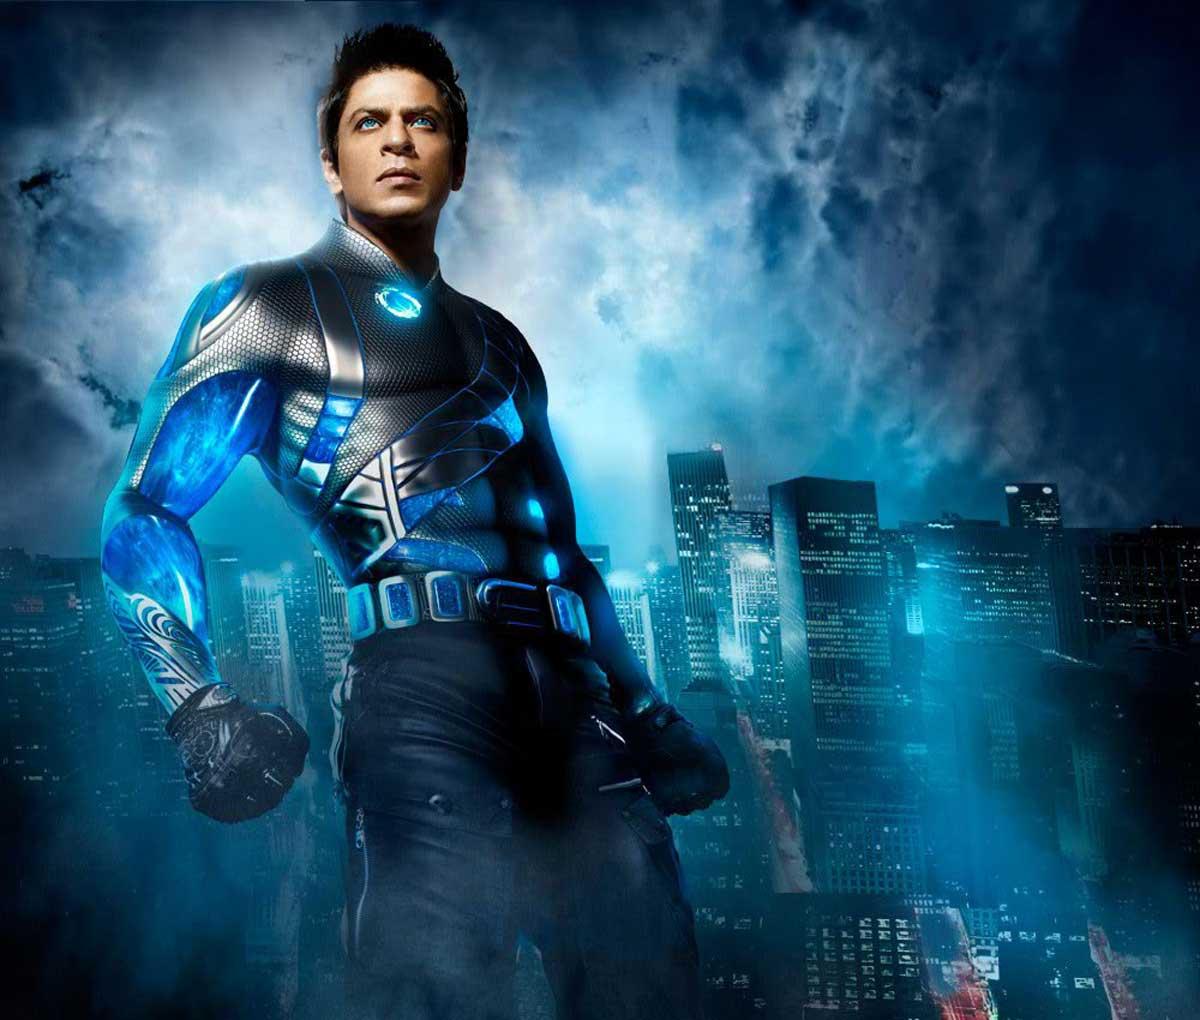 Super Hero Shahrukh Khan In Ra One Movie HD Desktop Wallpaperjpg 1200x1020